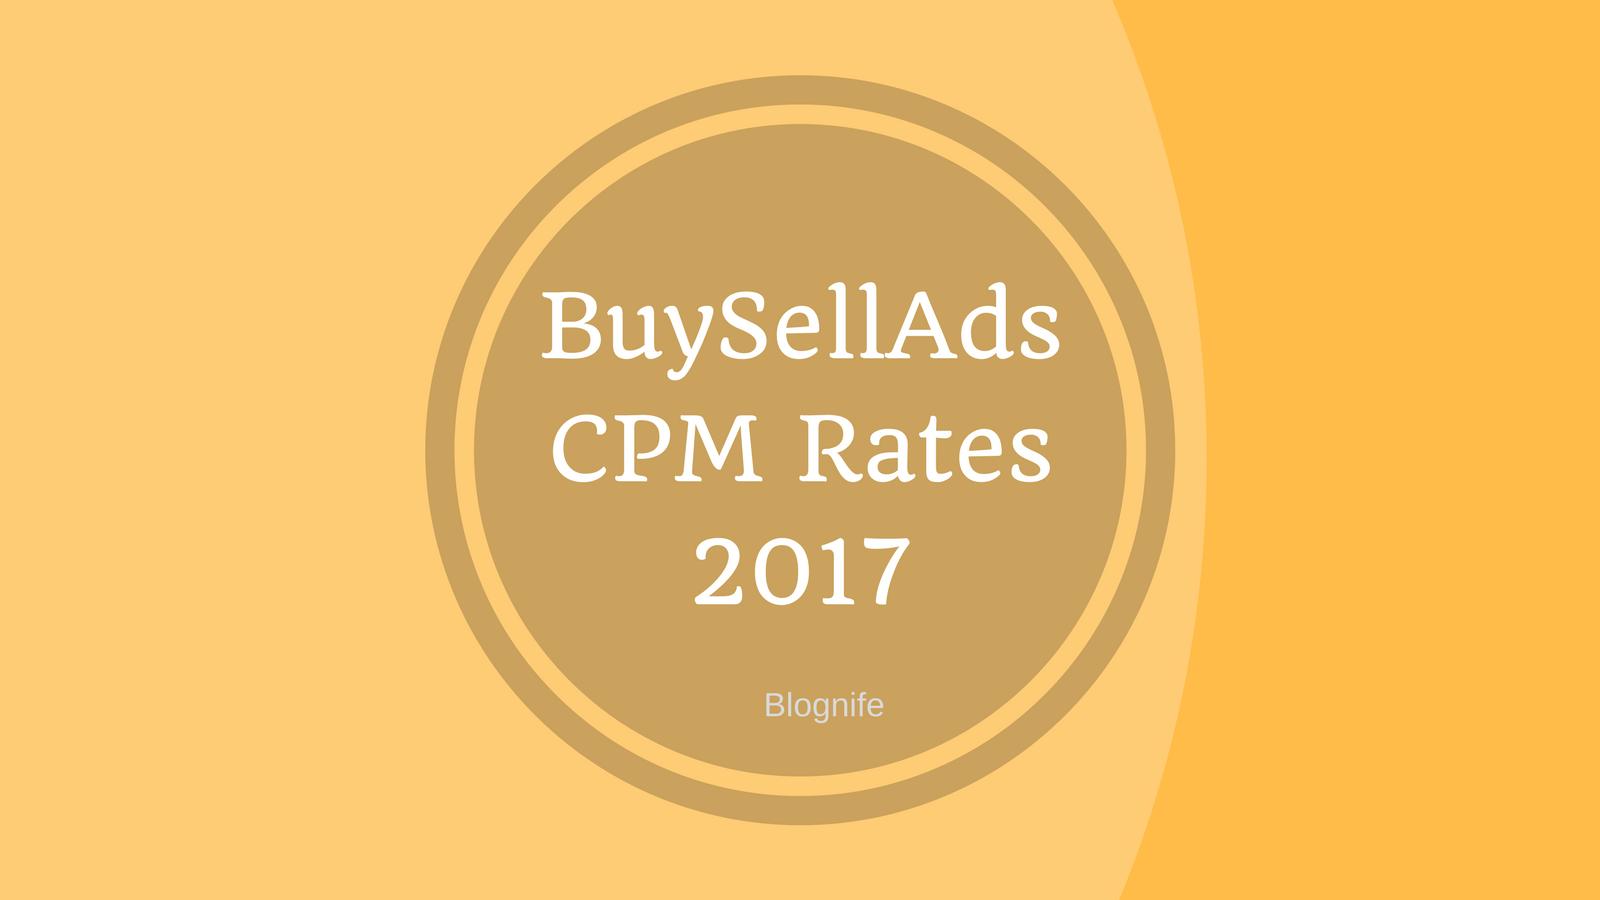 BuySellAds CPM Rates 2017